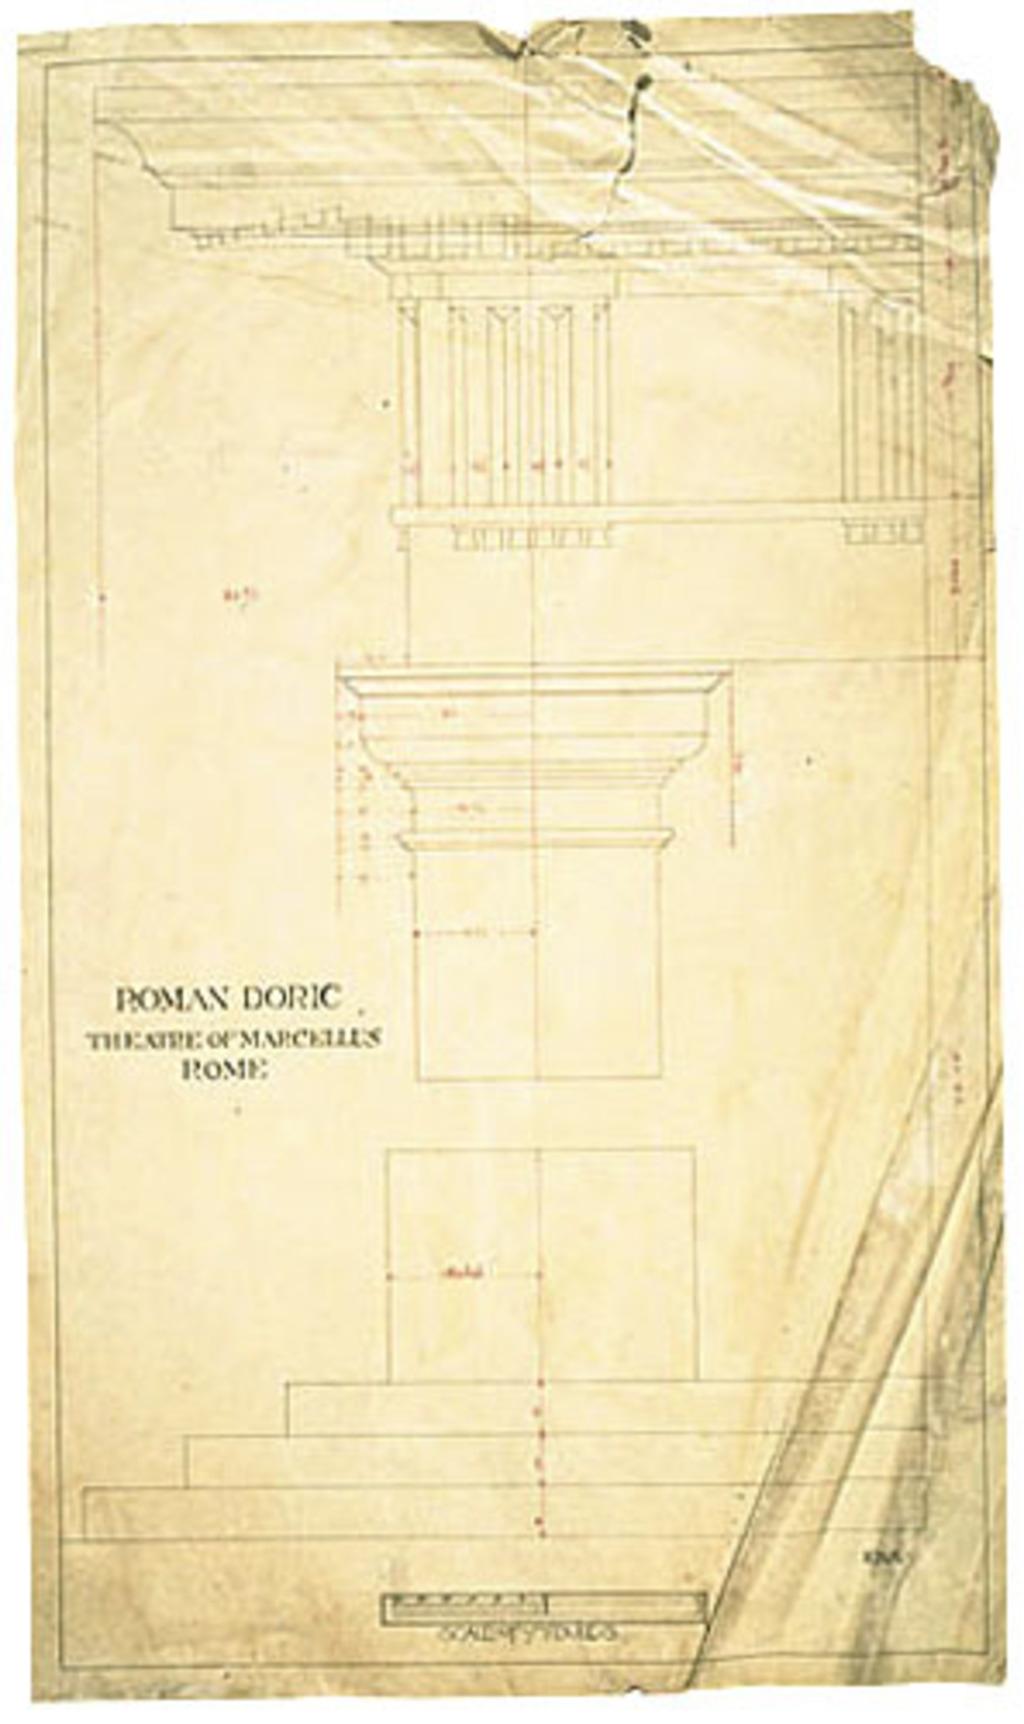 Roman Doric, Theatre of Marcellus, Rome